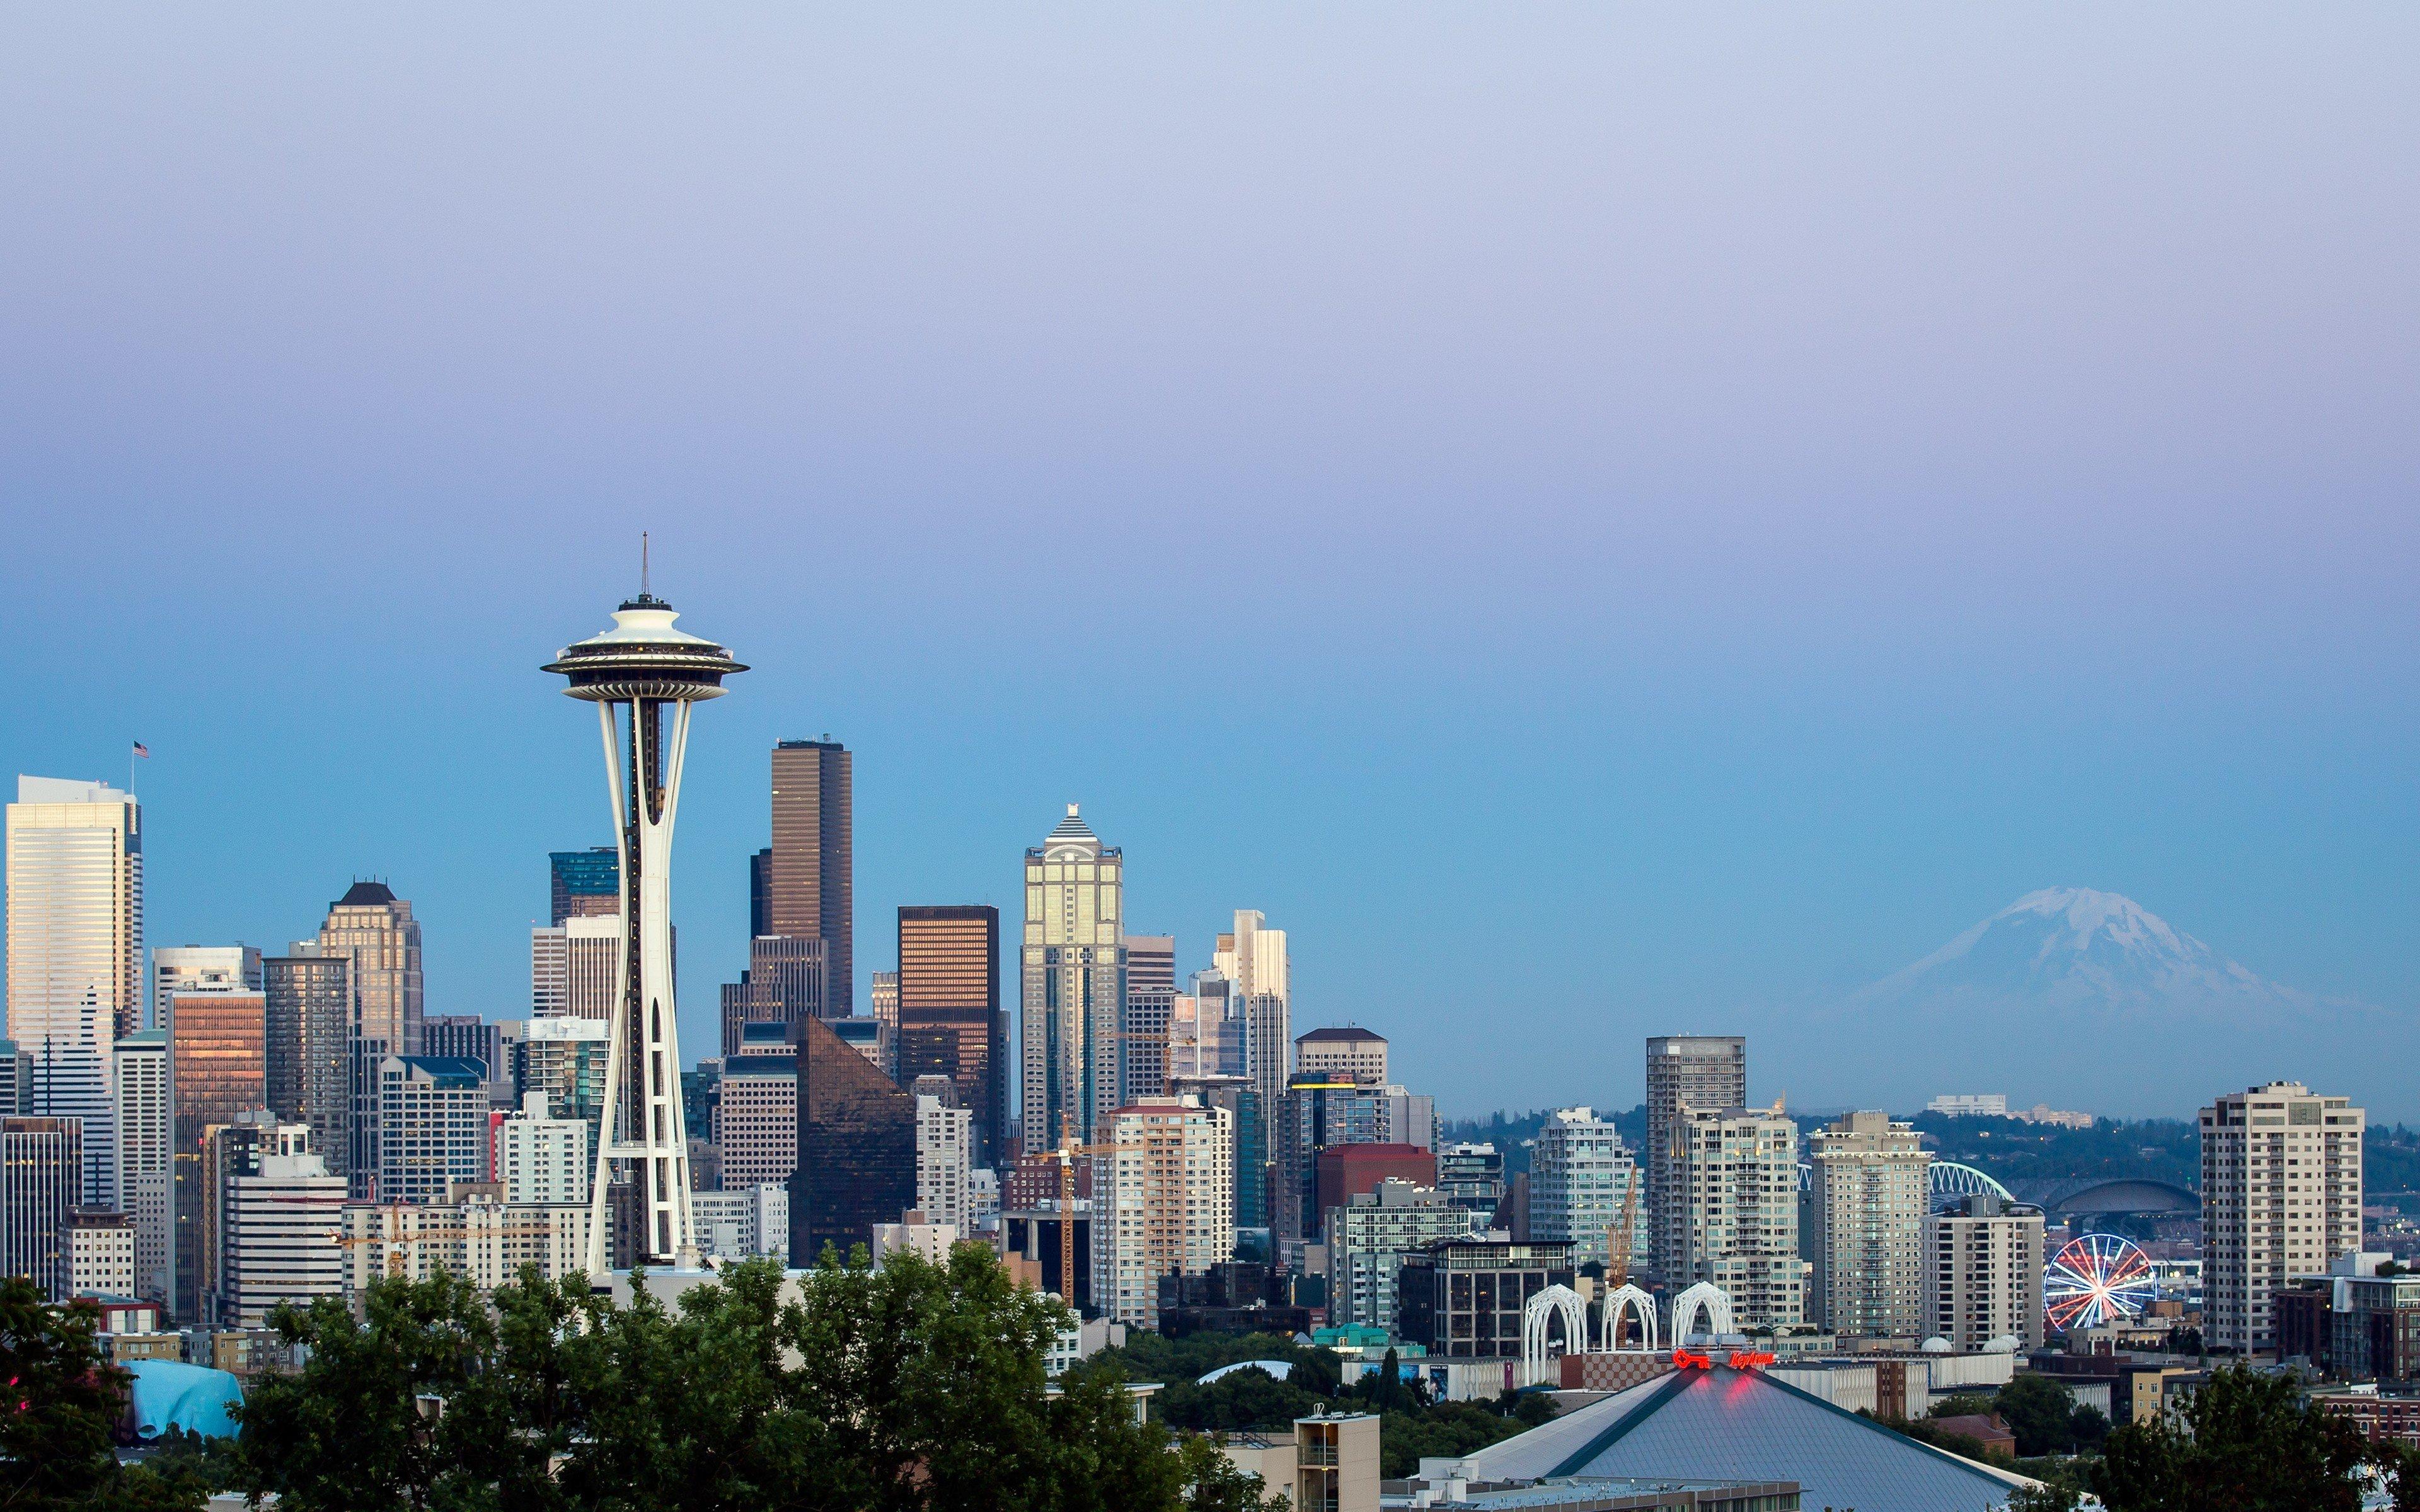 Seattle USA skyscrapers Washington Space Needle wallpaper background 3840x2400